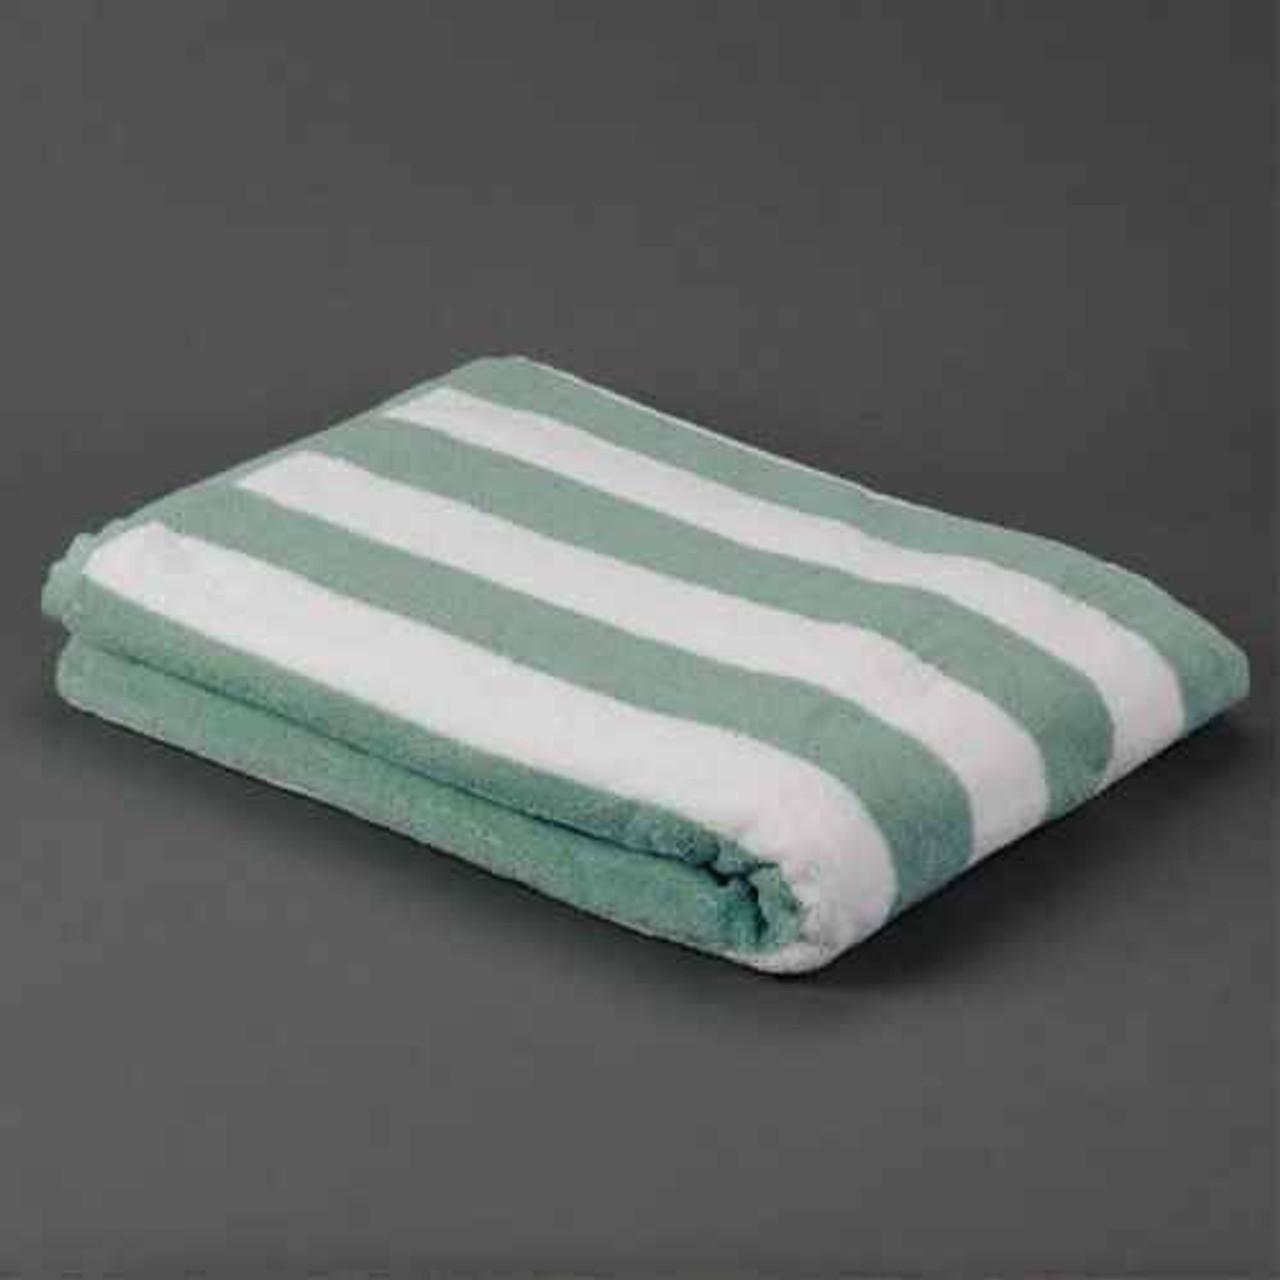 Ganesh Mills or Oxford Super Blend Ganesh Mills or Oxford Cabana 2X2 Stripe Pool Towels or Pack of 1 DZ